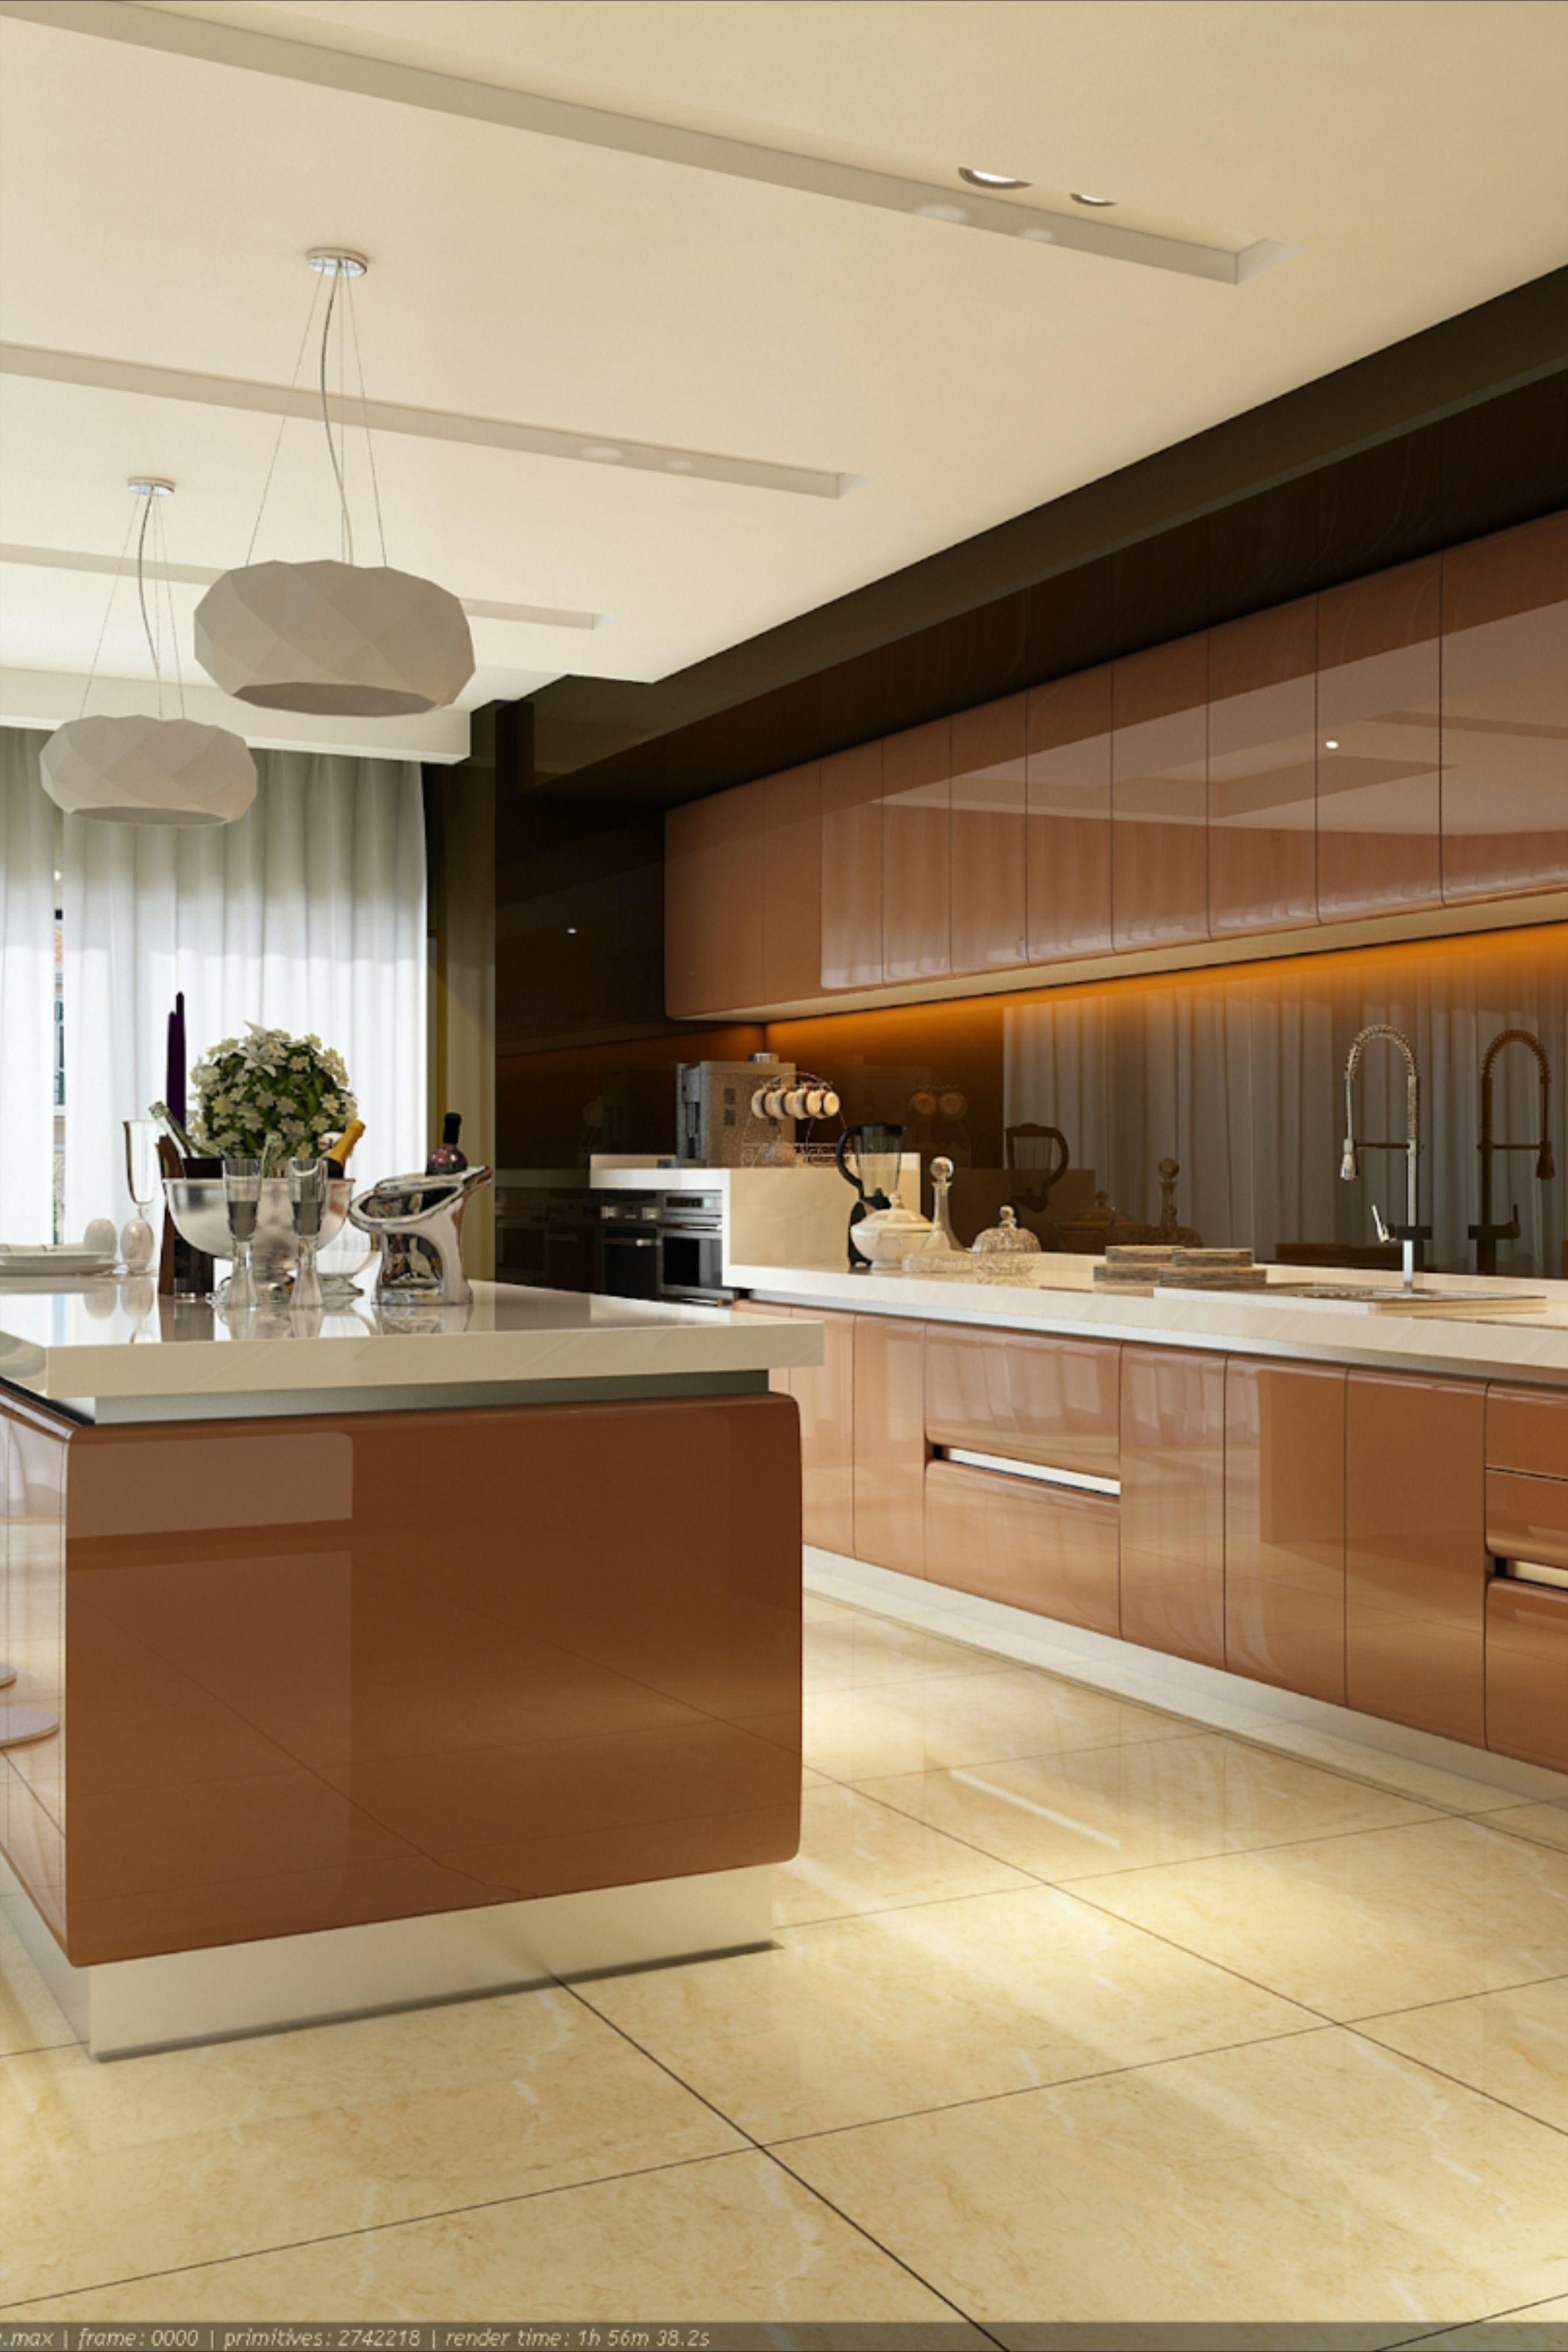 High Gloss Kitchen Cabinet | High gloss kitchen cabinets ...